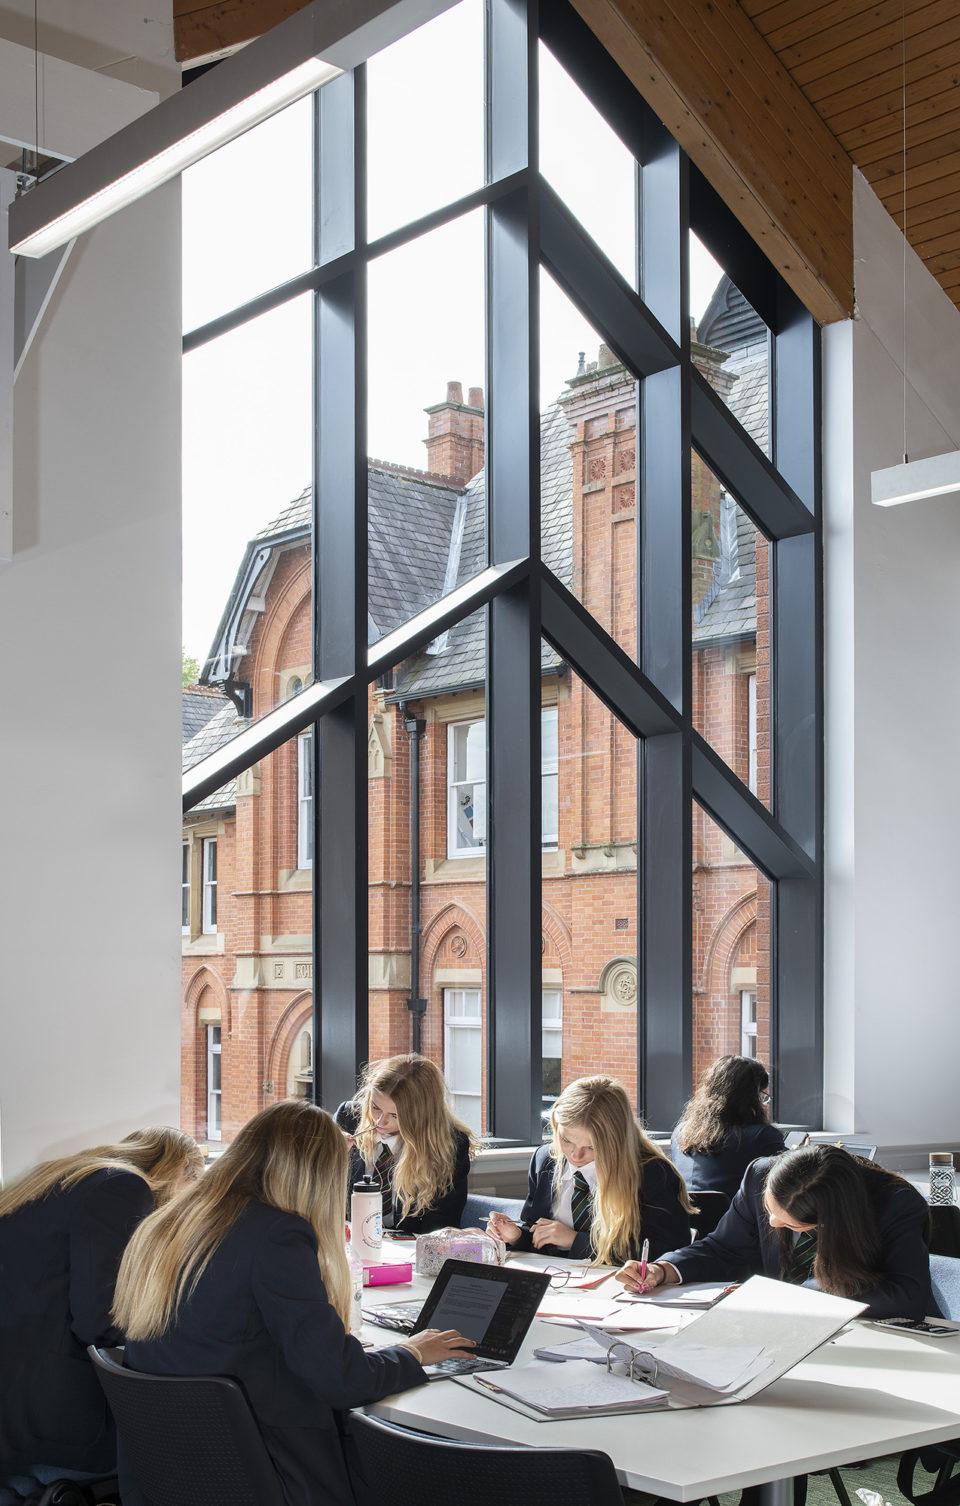 Cheadle Hulme School Sixth Form Centre